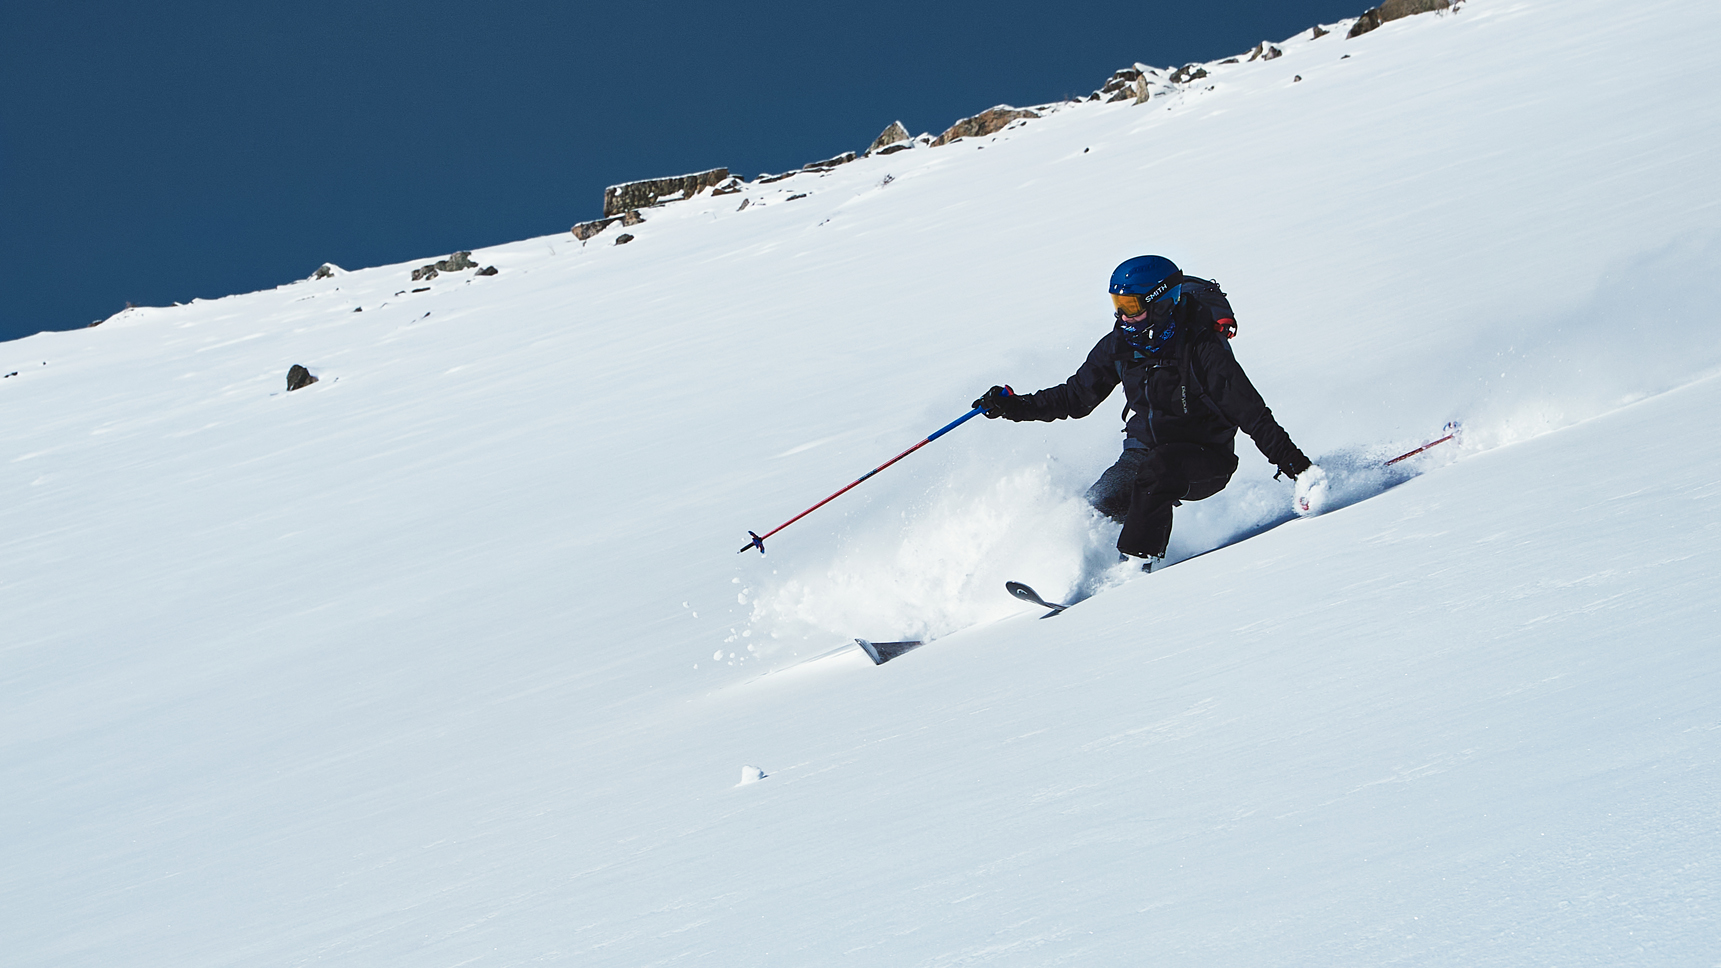 backcountry skiier making an aggressive turn in knee deep powder